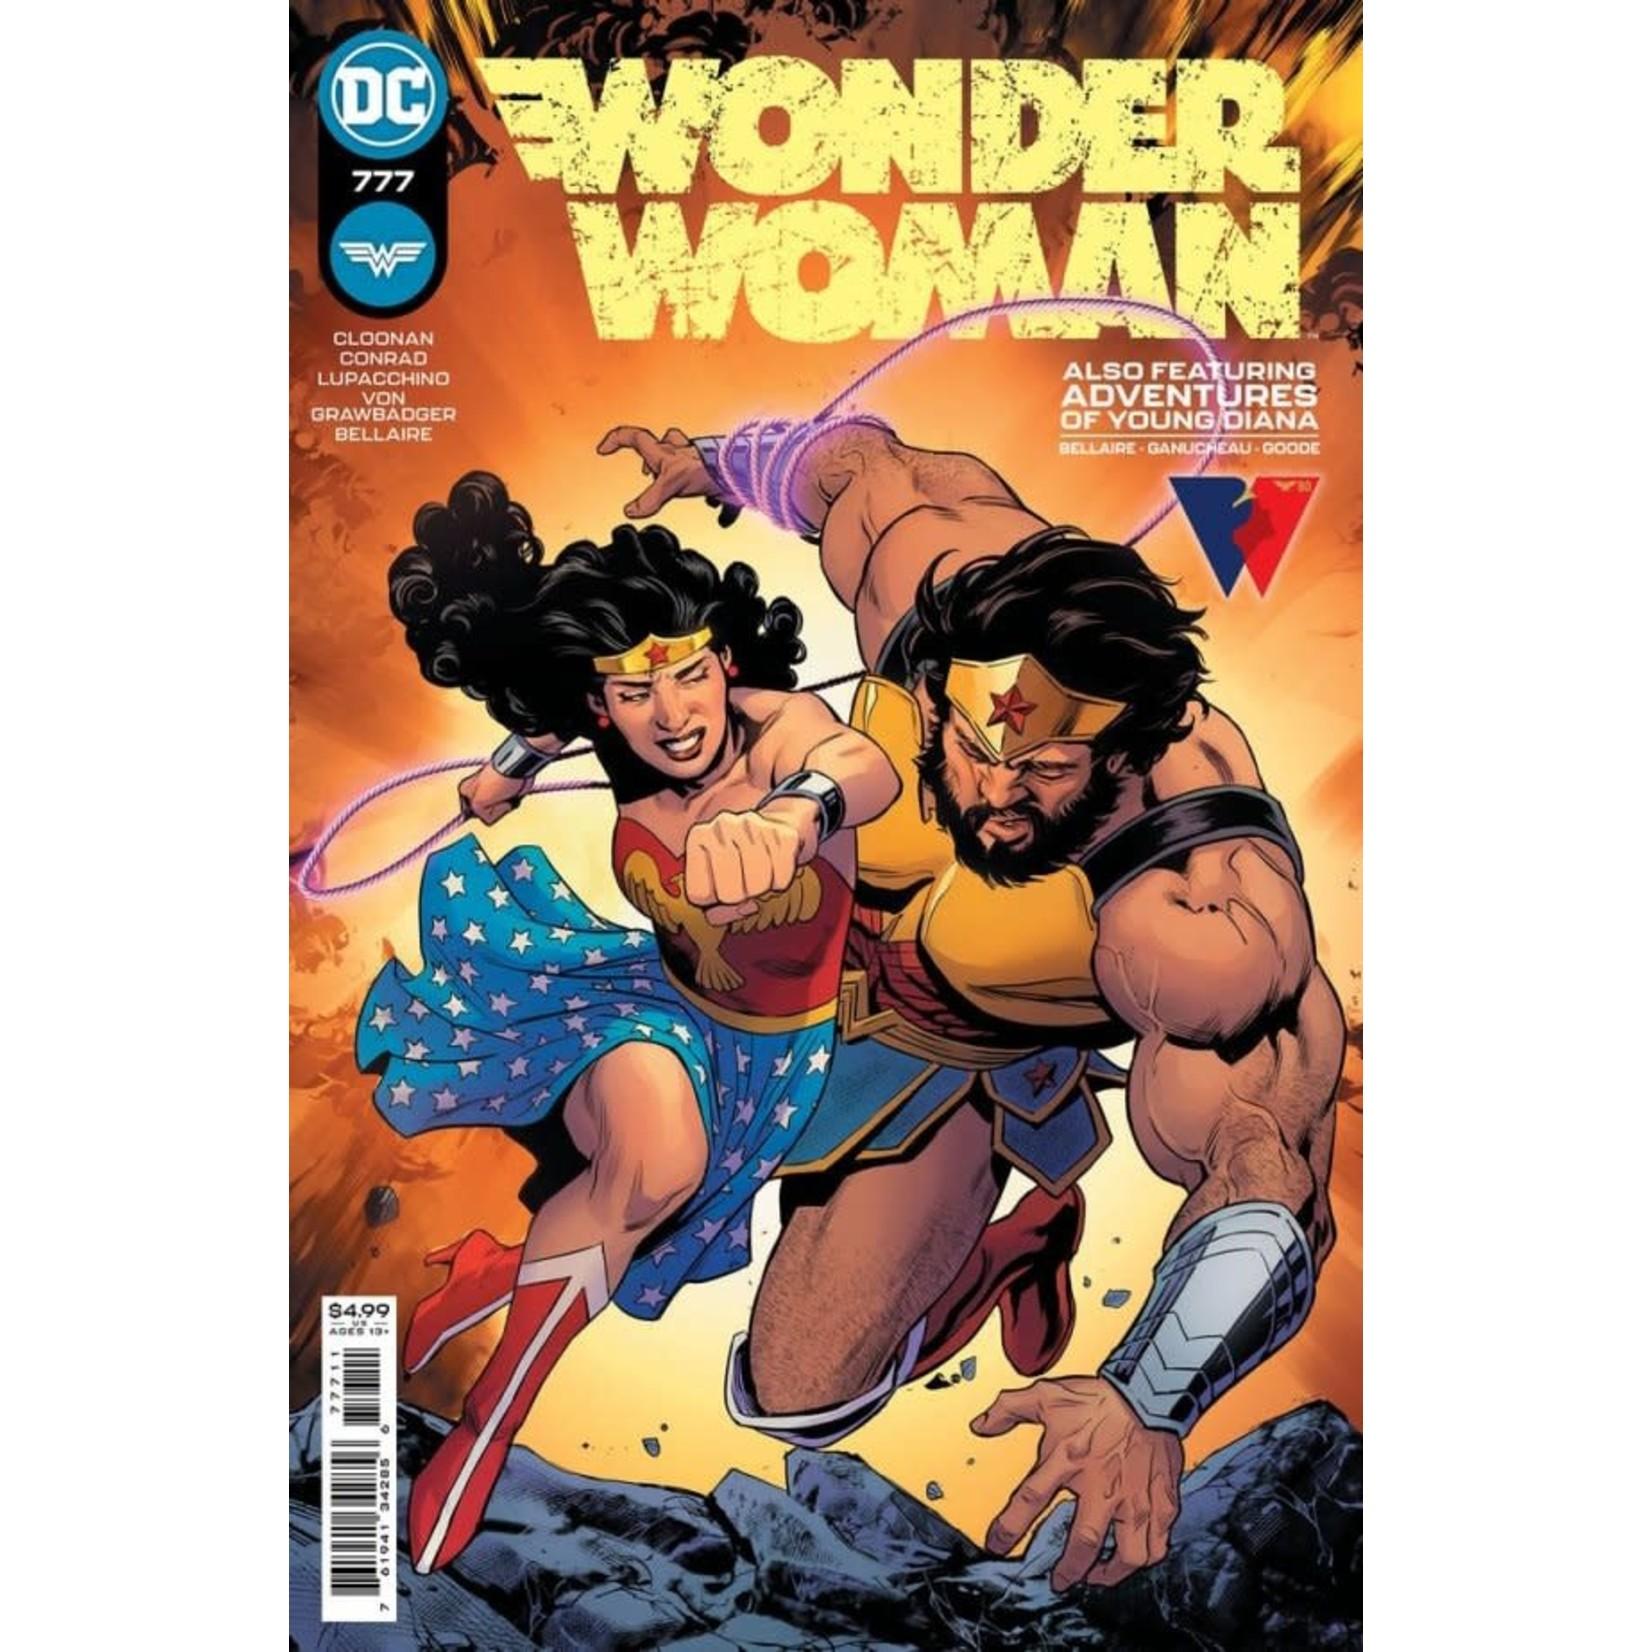 DC Comics Wonder Woman #777 Cover A